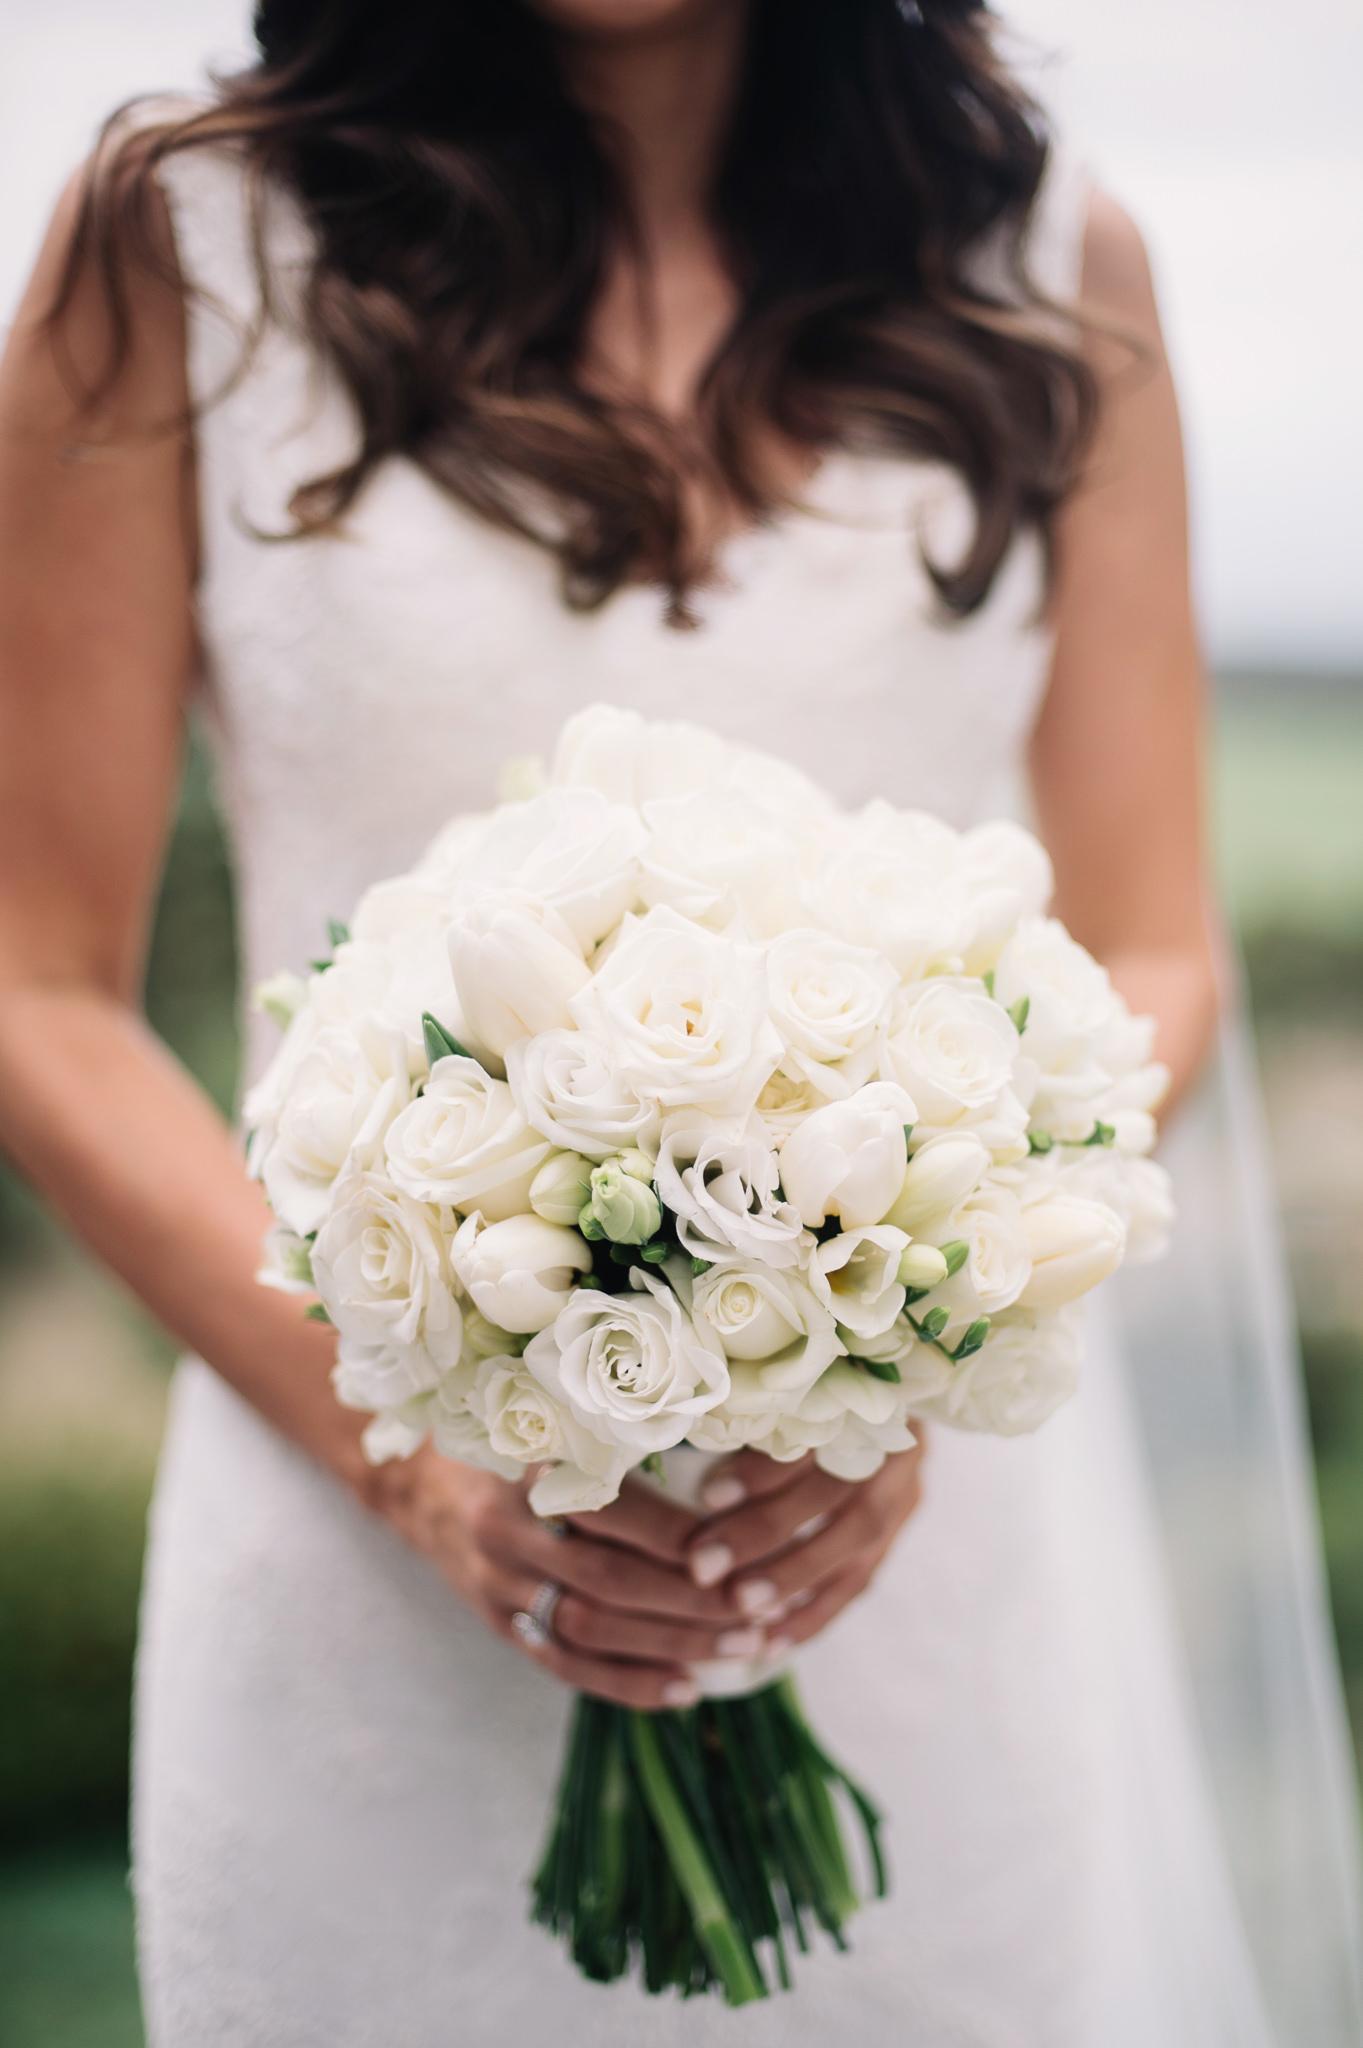 wedding_bouquet_by_bek_burrows